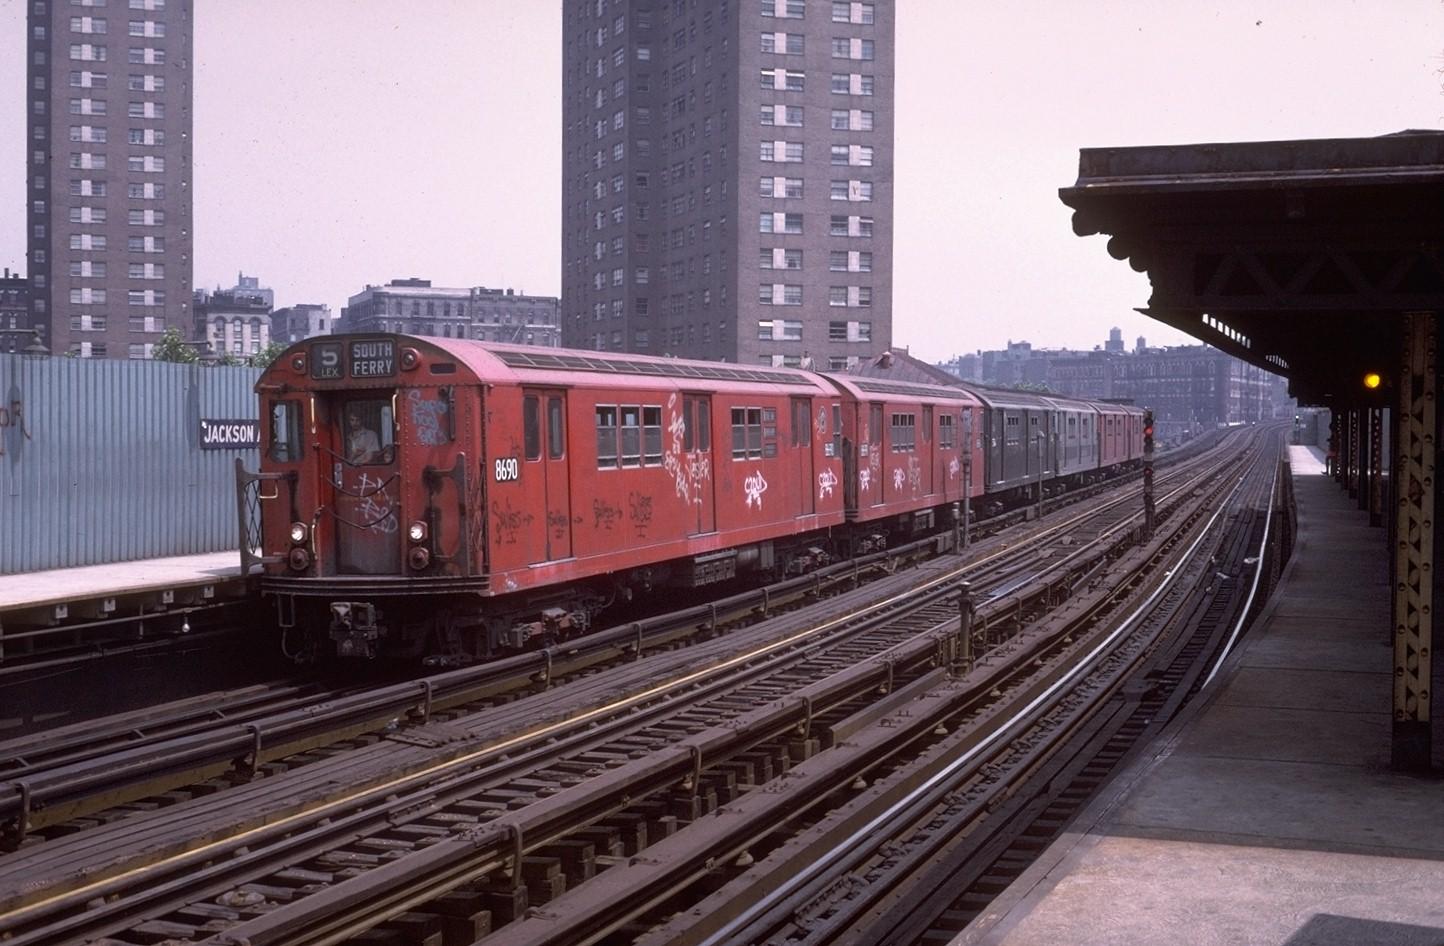 (333k, 1444x946)<br><b>Country:</b> United States<br><b>City:</b> New York<br><b>System:</b> New York City Transit<br><b>Line:</b> IRT White Plains Road Line<br><b>Location:</b> Jackson Avenue <br><b>Route:</b> 5<br><b>Car:</b> R-29 (St. Louis, 1962) 8690 <br><b>Photo by:</b> Steve Zabel<br><b>Collection of:</b> Joe Testagrose<br><b>Date:</b> 7/9/1972<br><b>Viewed (this week/total):</b> 0 / 4424